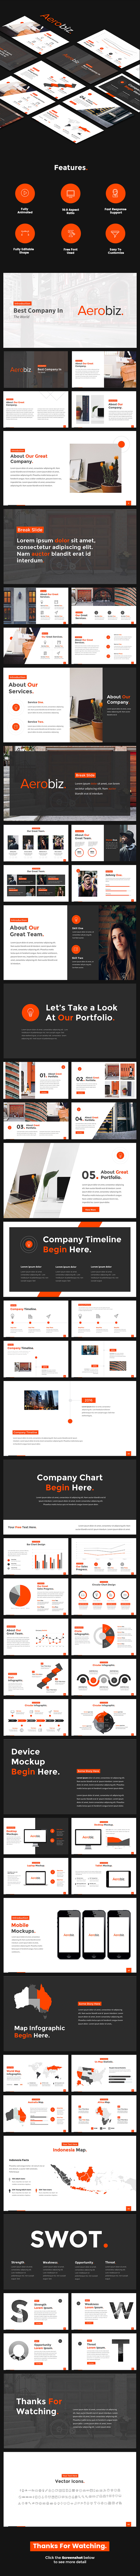 Aerobiz - Professional Business Keynote Template - Business Keynote Templates